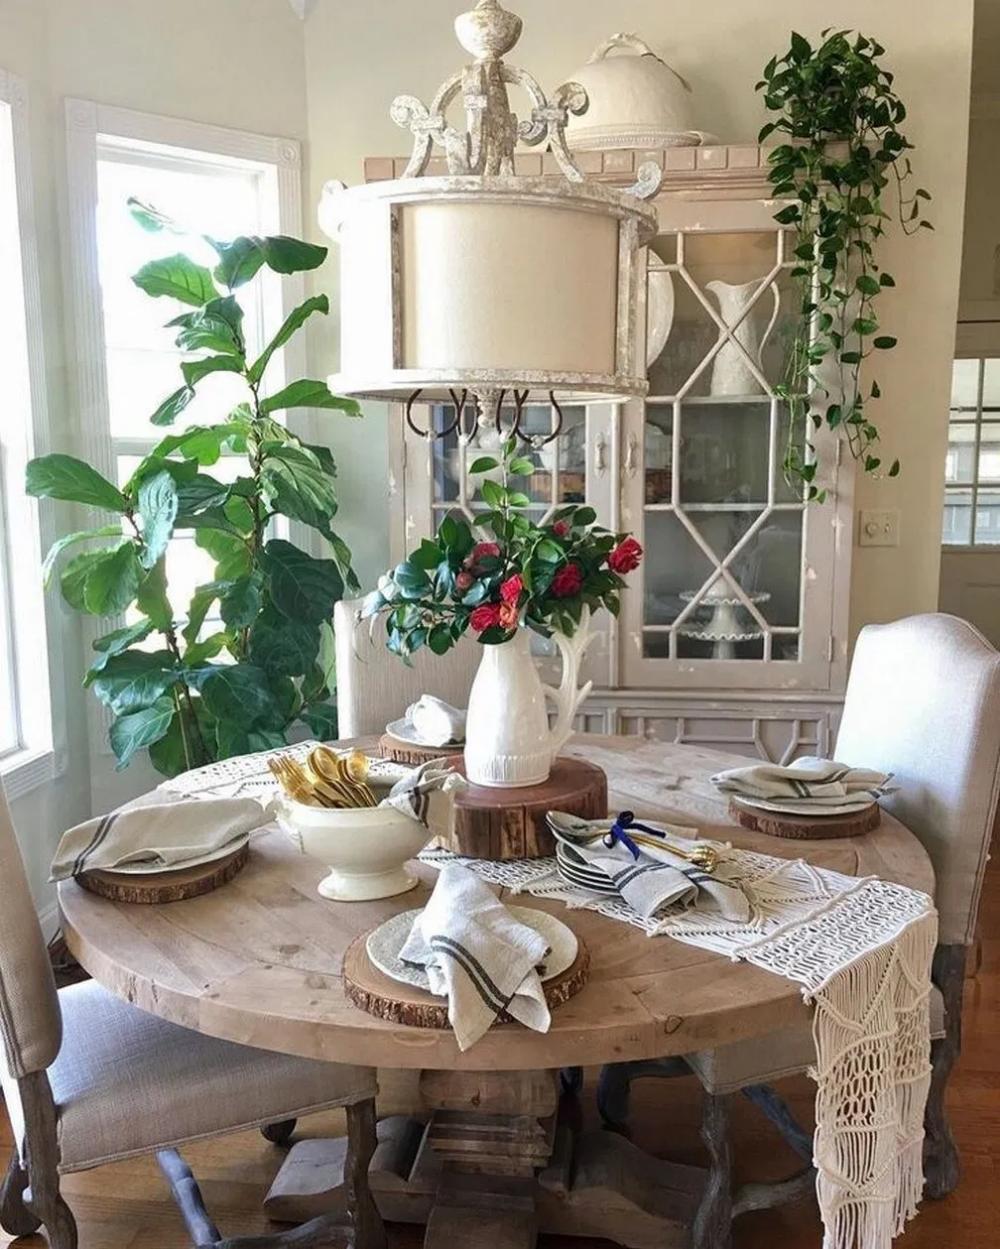 19 Urban Dining Room Designs Decorating Ideas: 28 Diy Farmhouse Living Room Decor Ideas 11 In 2020